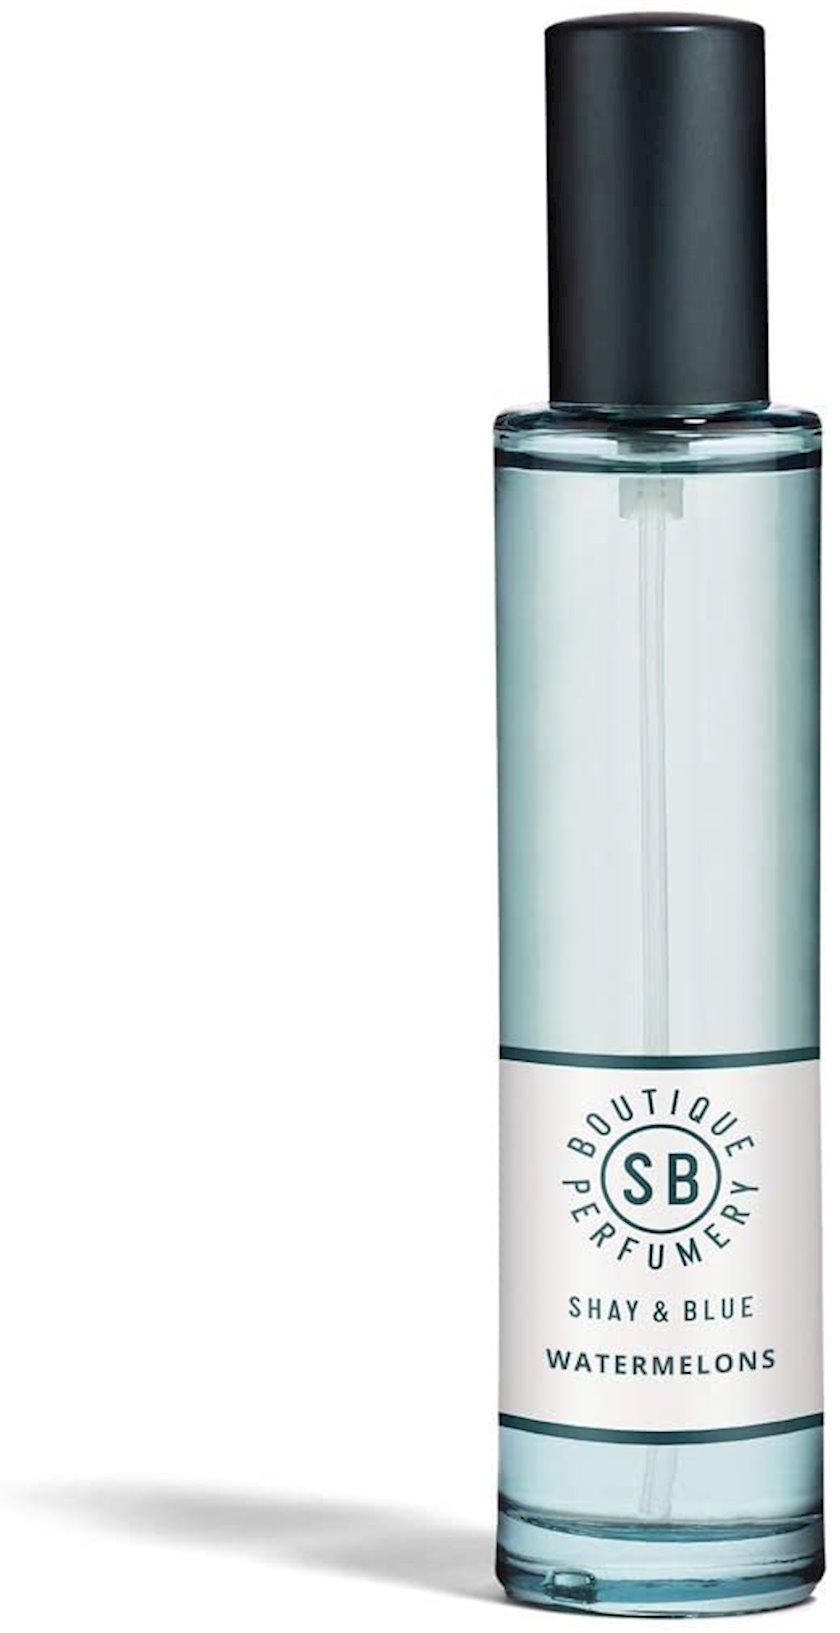 Ətir suyu Shay & Blue Watermelons Natural Spray Fragrance 30 ml